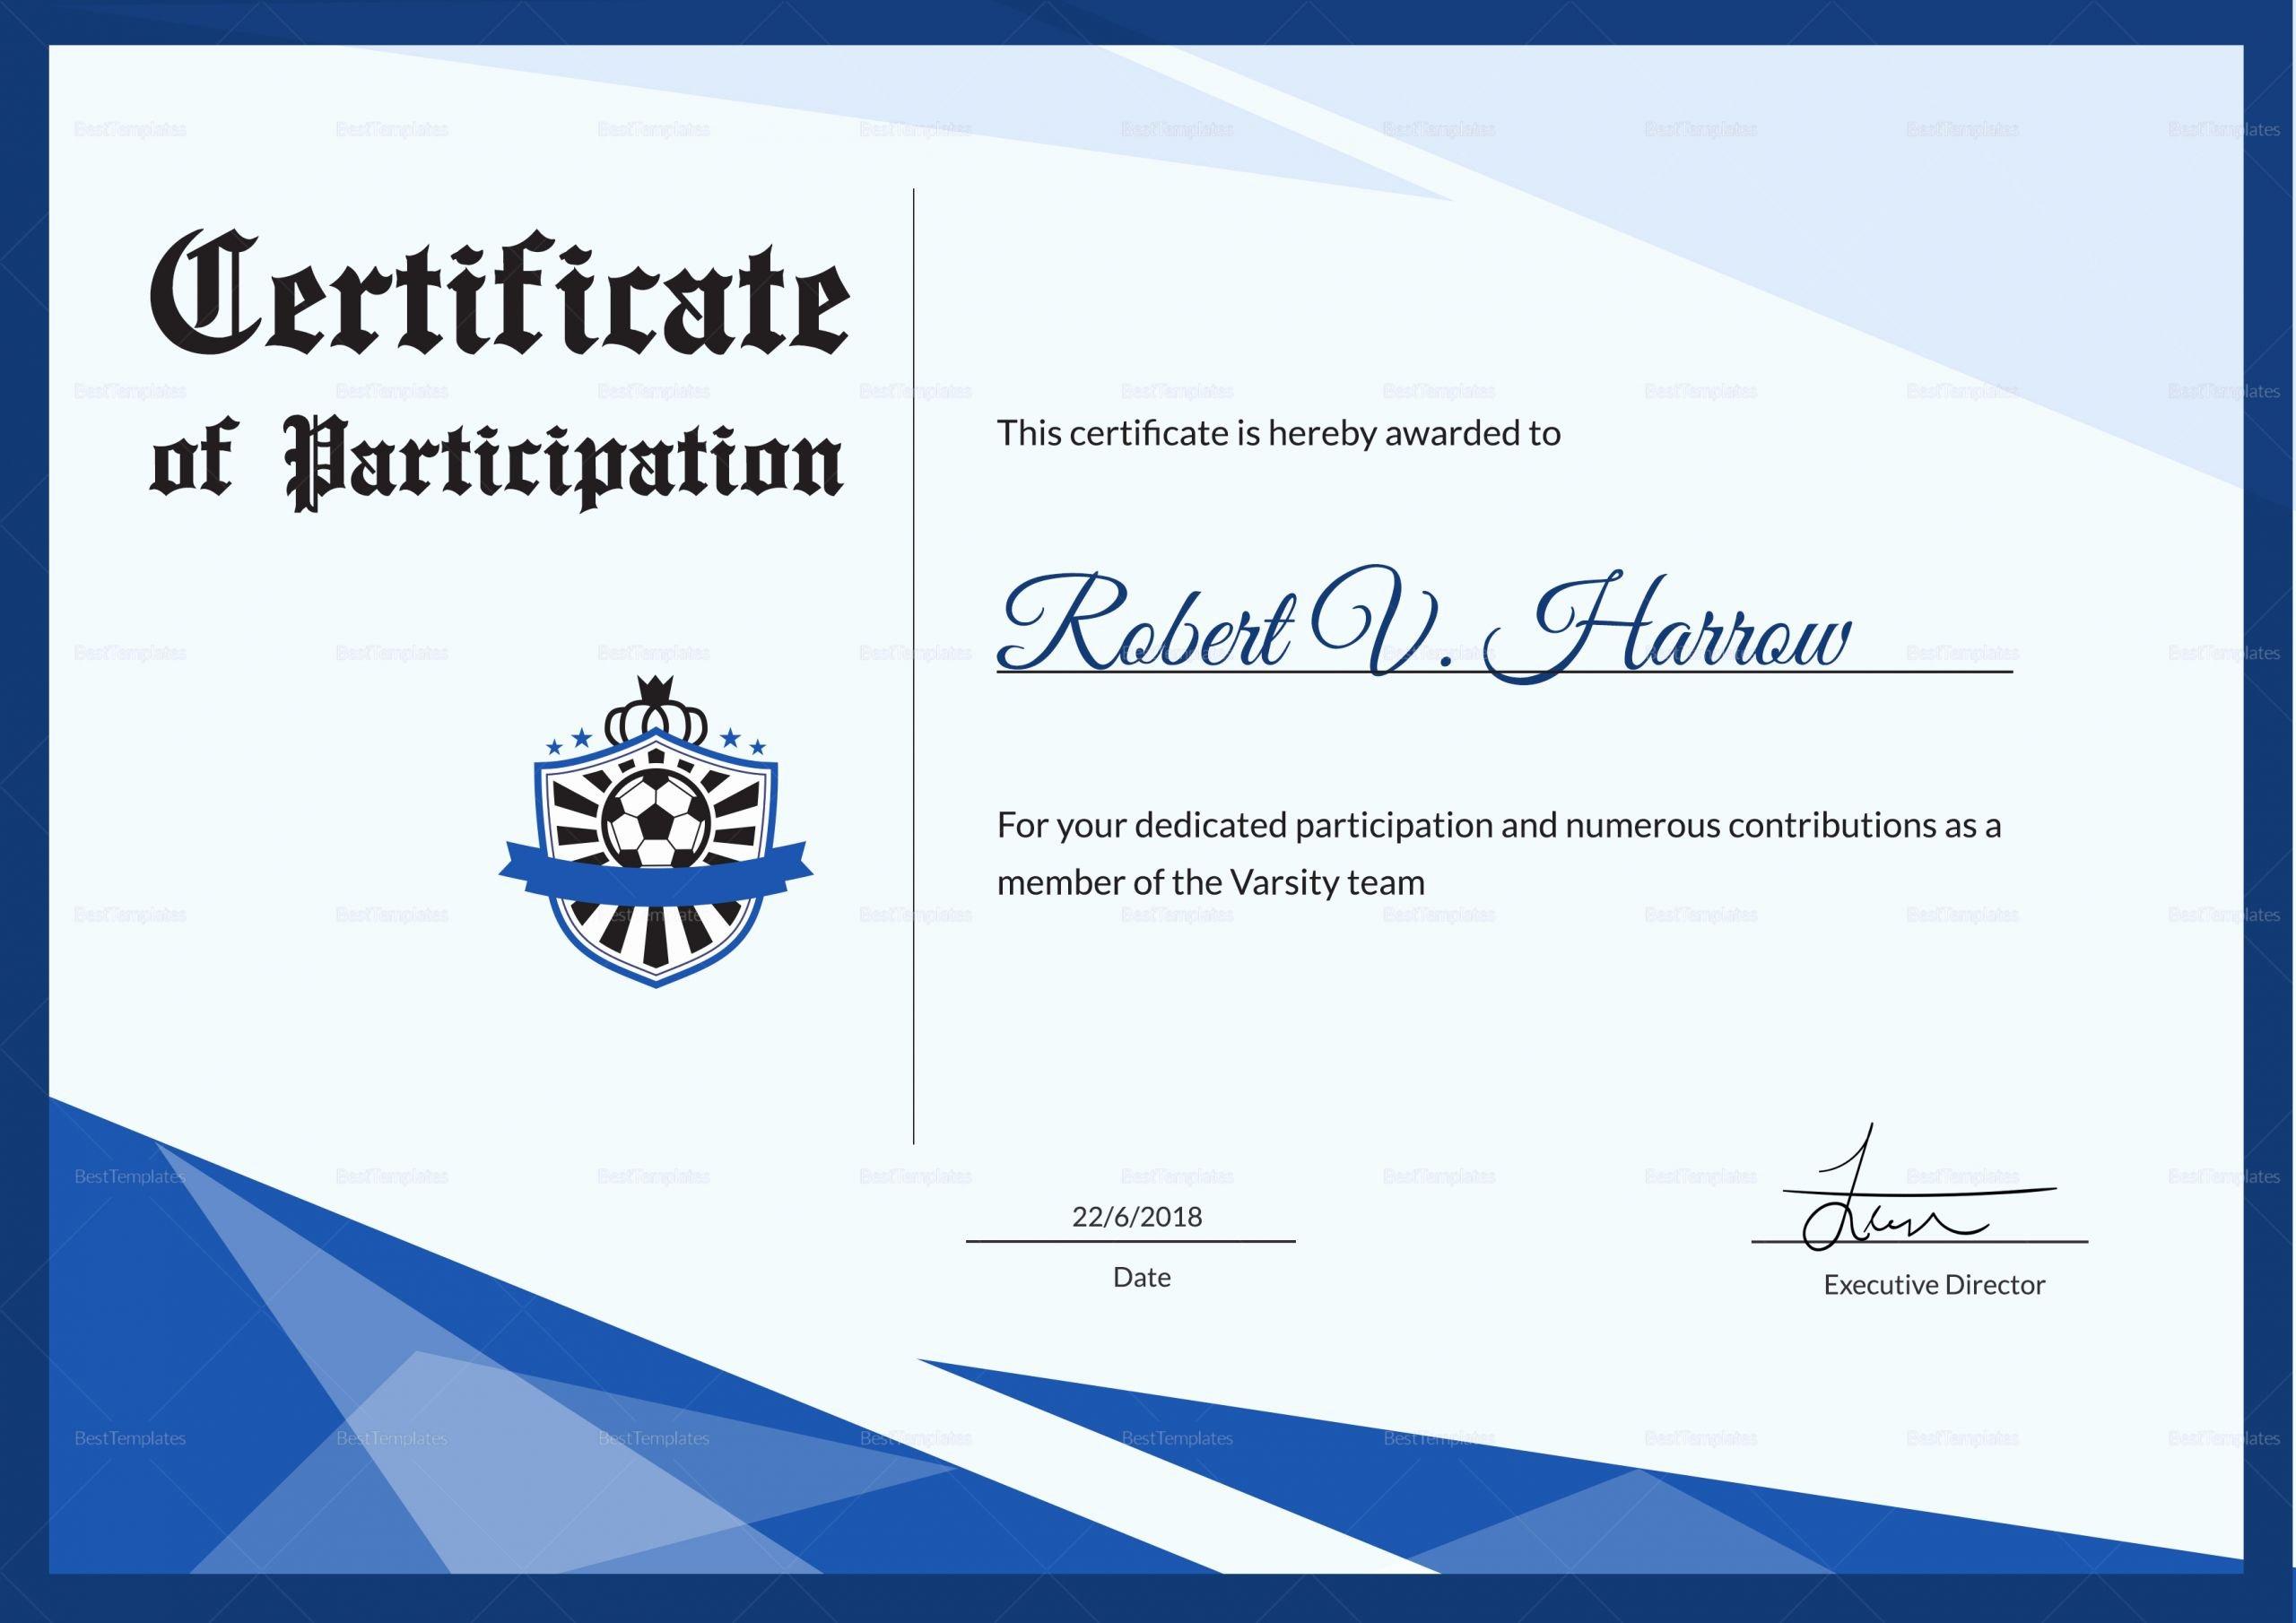 Free Football Certificates Templates Beautiful Football Award Certificate Design Template In Psd Word